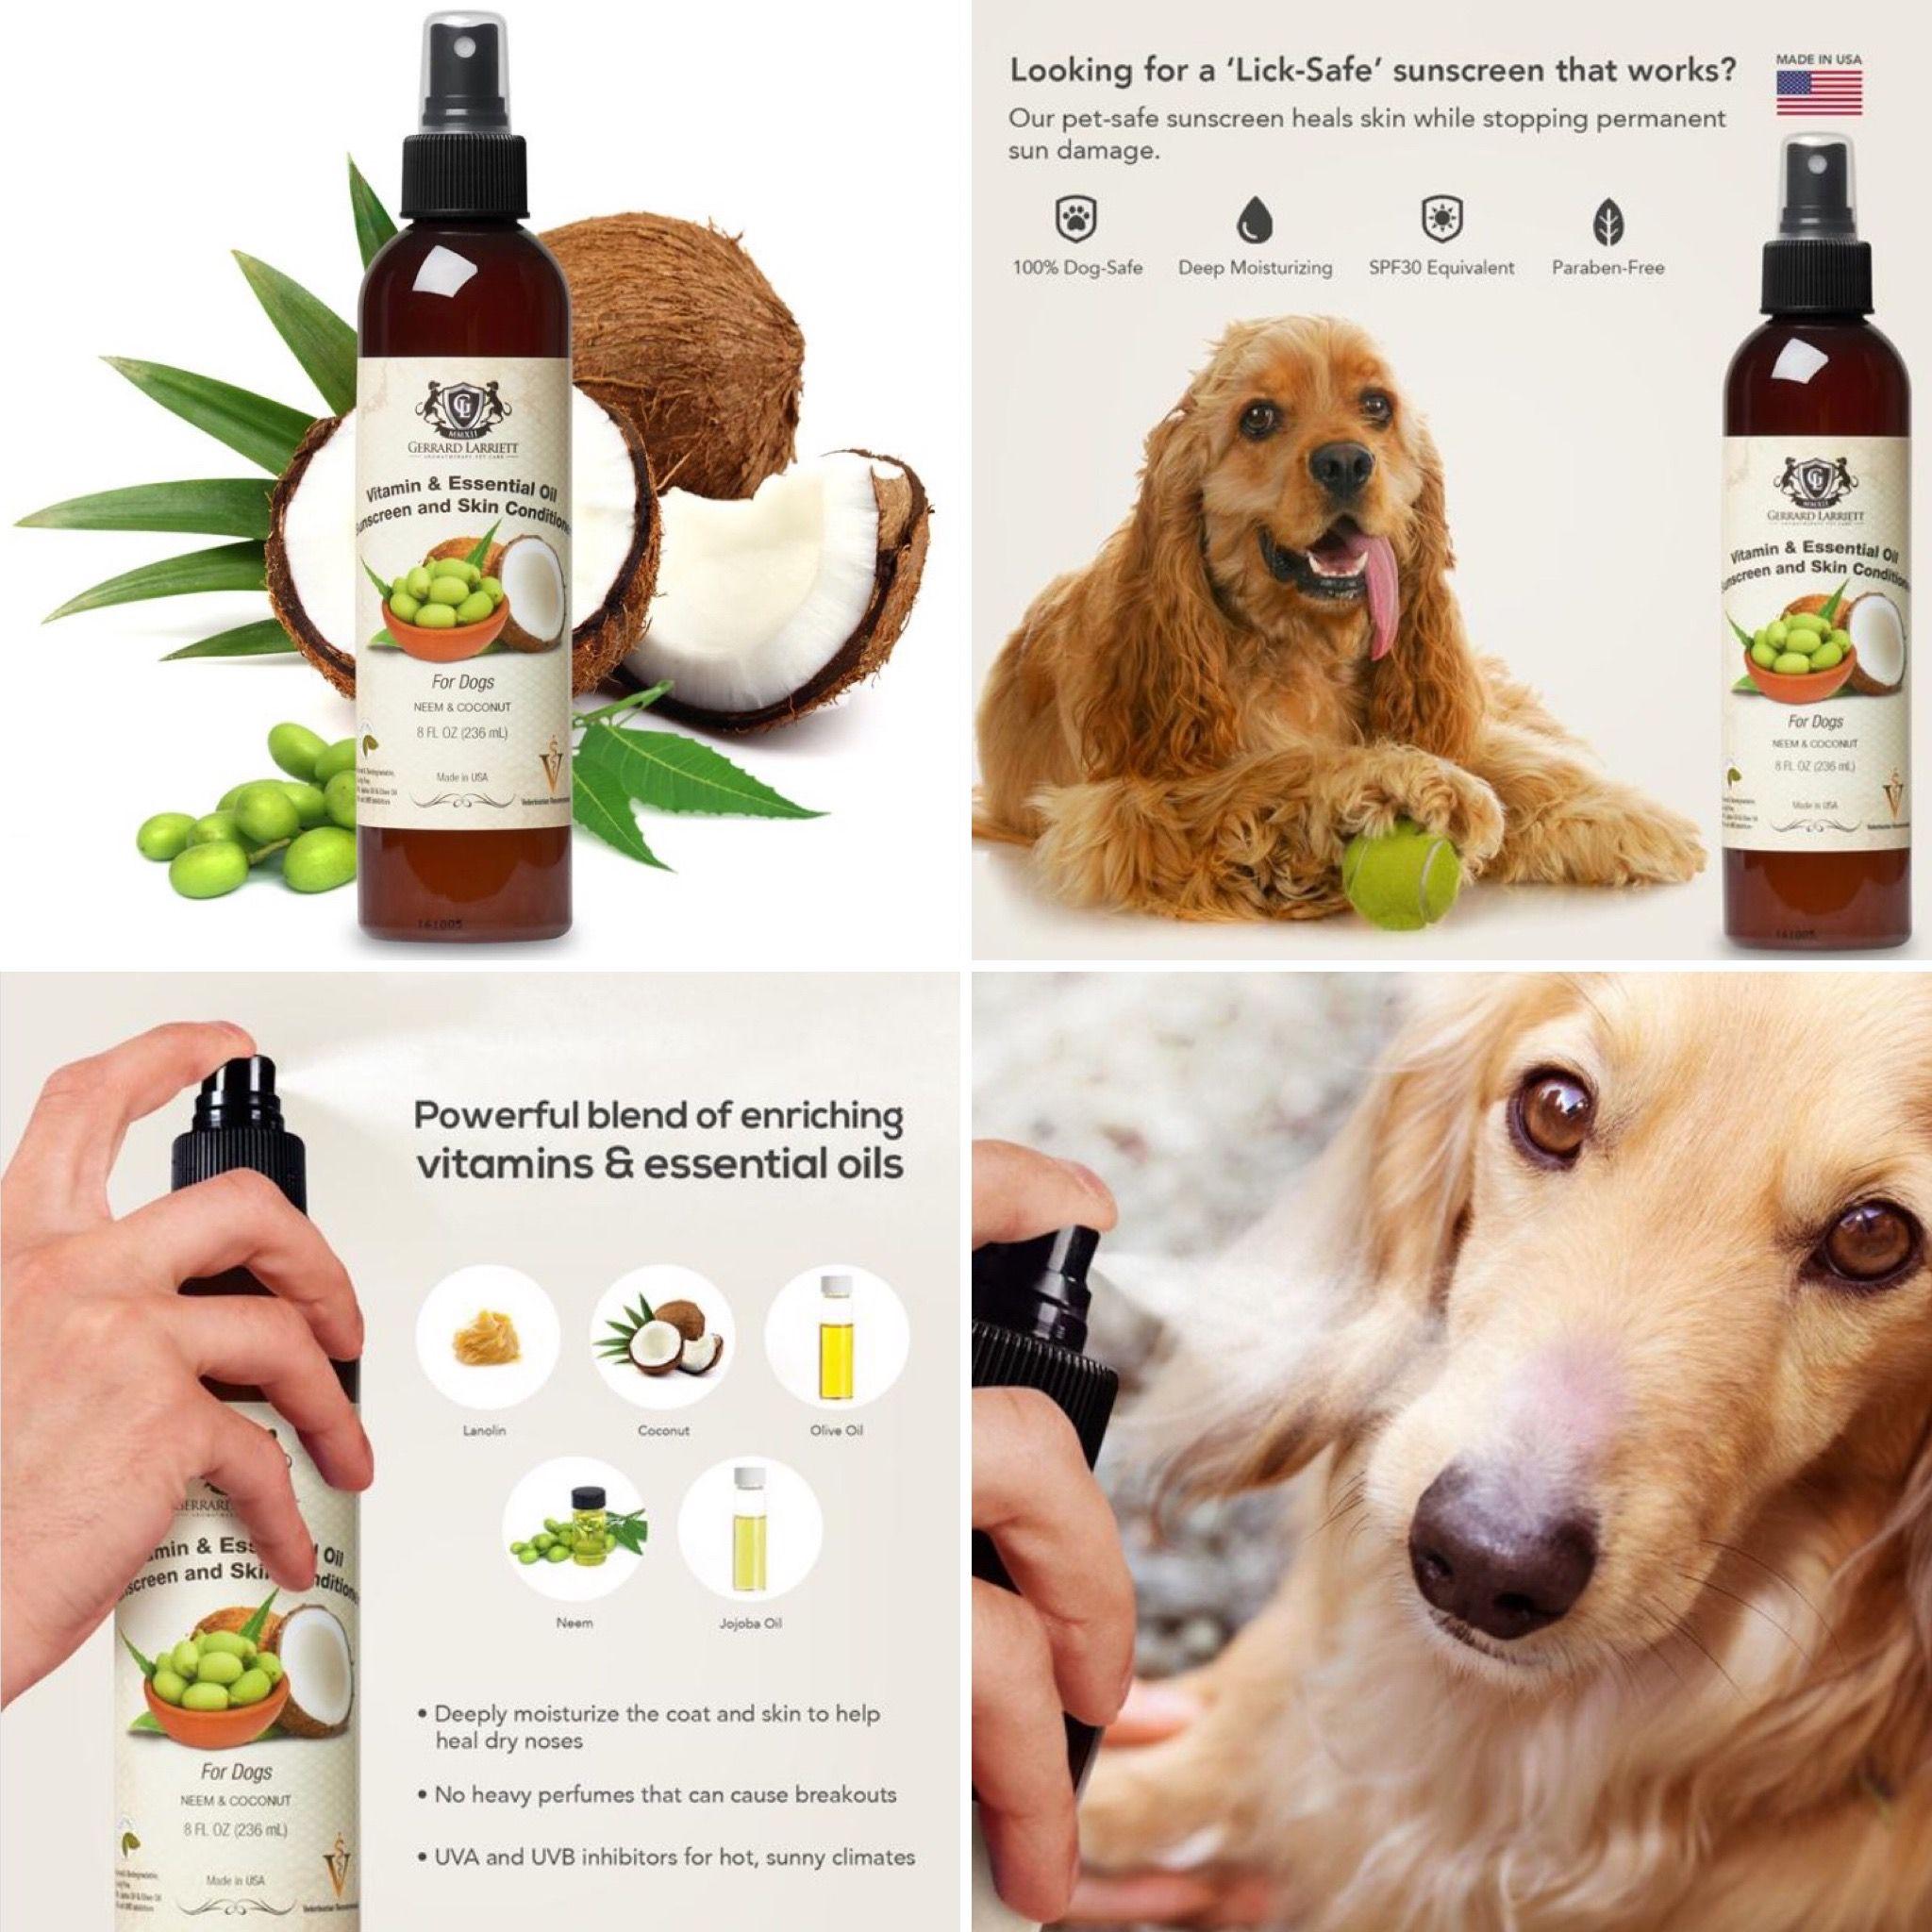 natural dog sunscreen